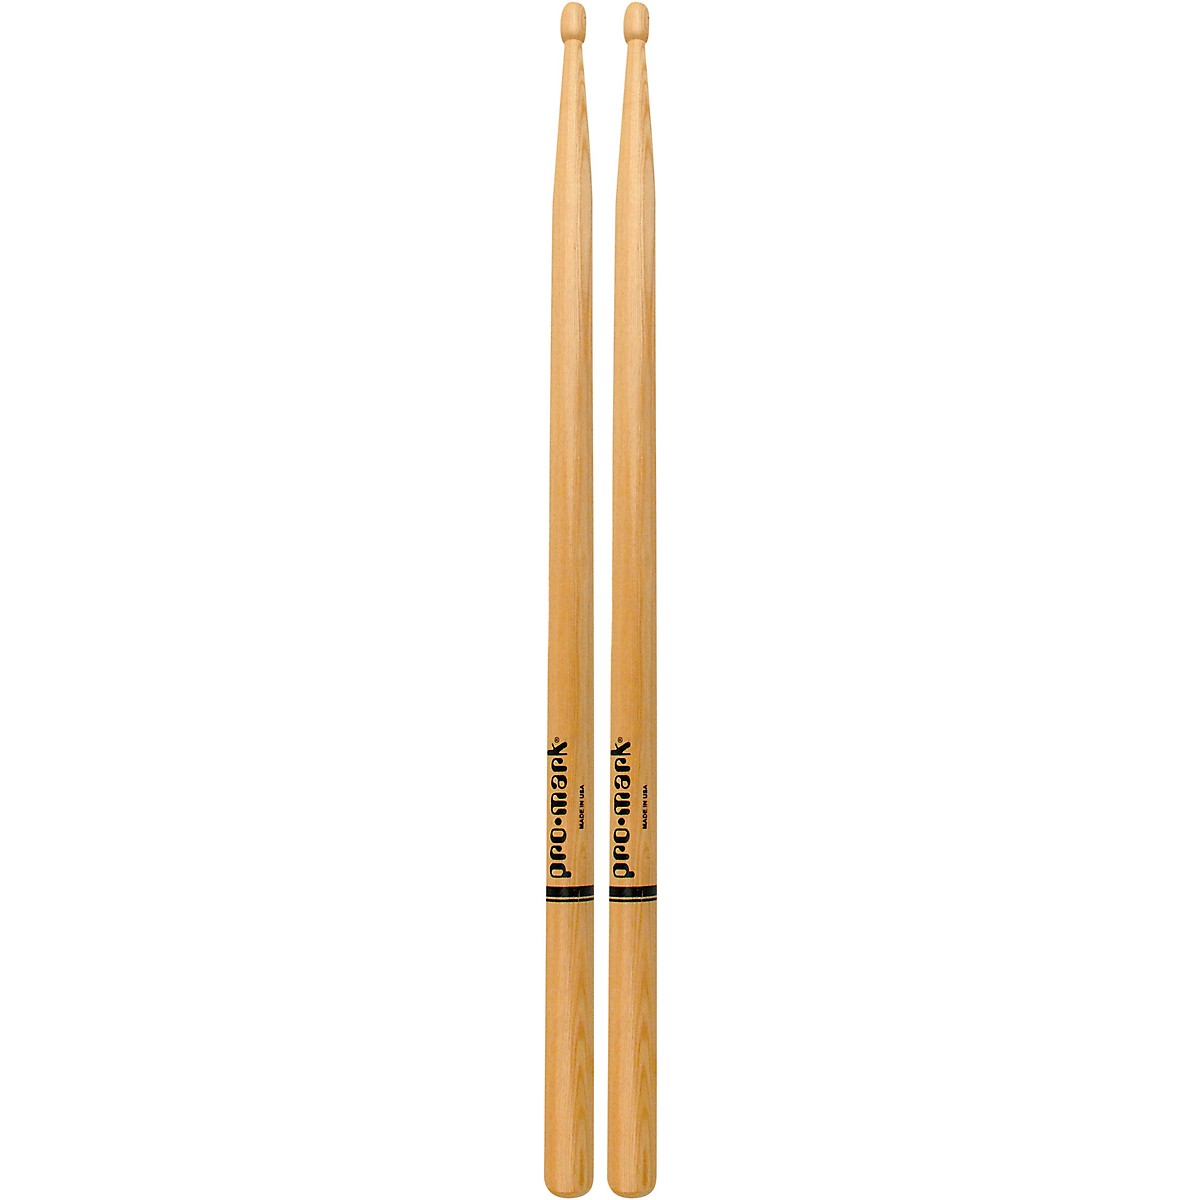 Promark Giant Drumsticks (Pair)